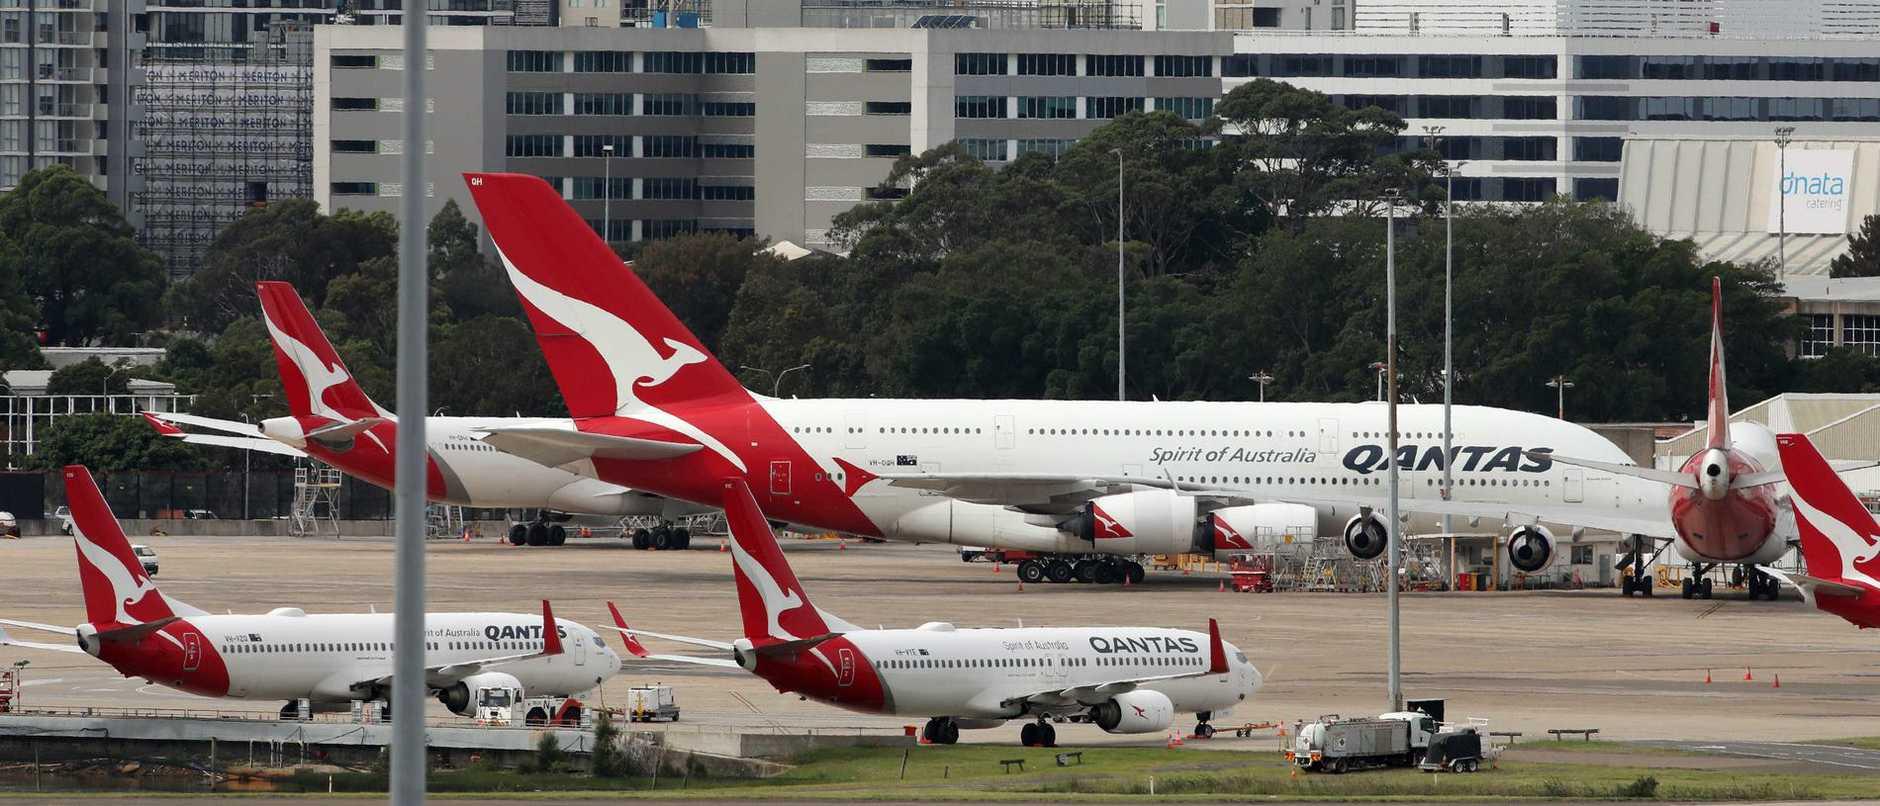 Qantas Planes Park Up